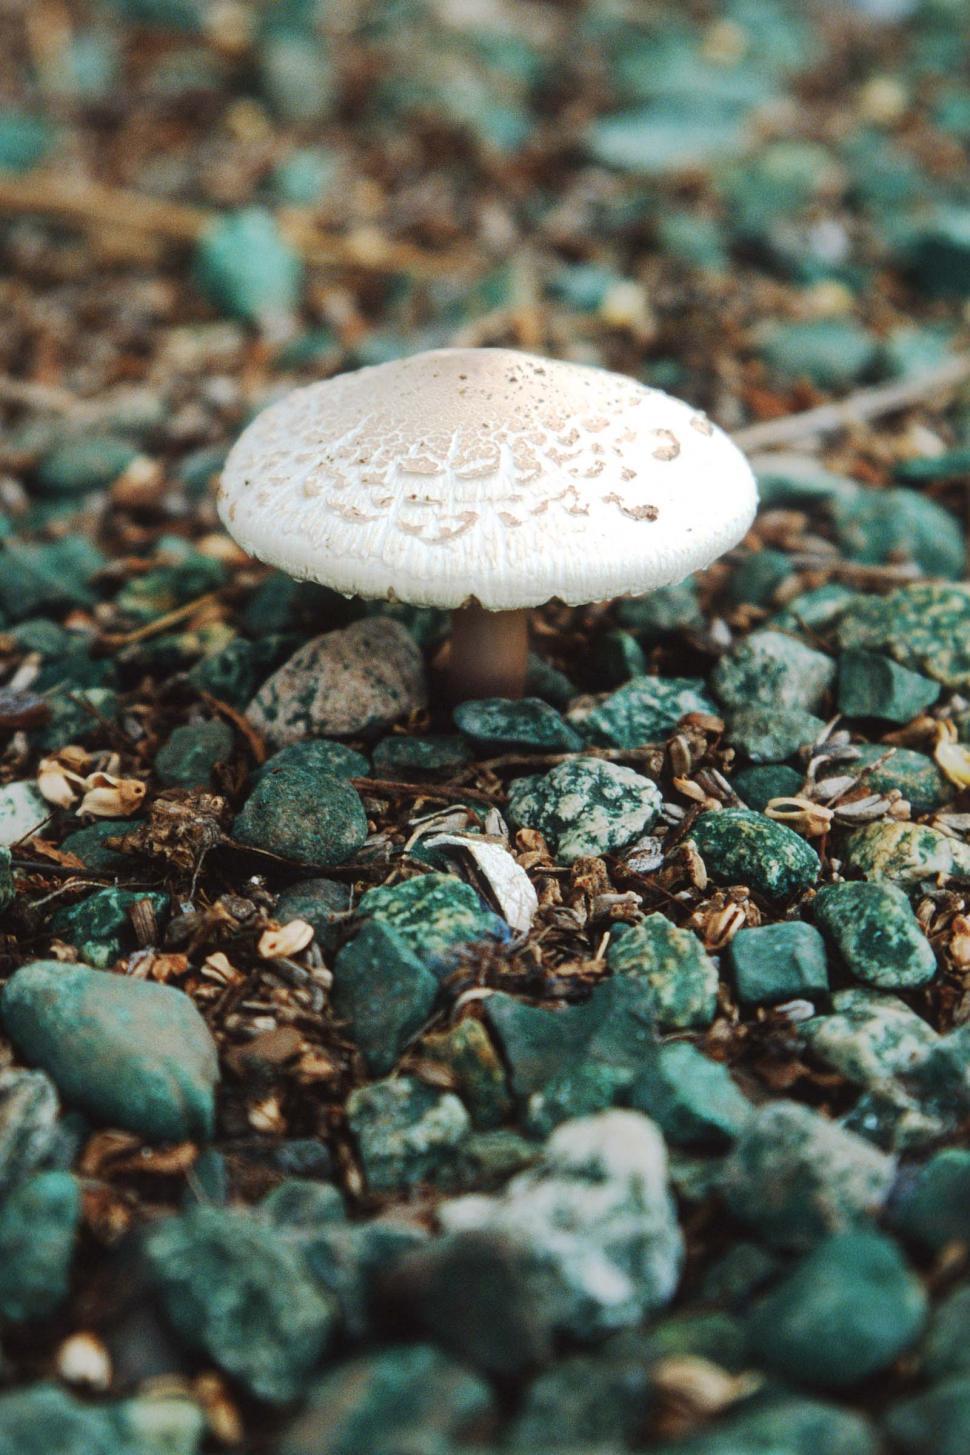 Download Free Stock HD Photo of Mushroom in green gravel Online